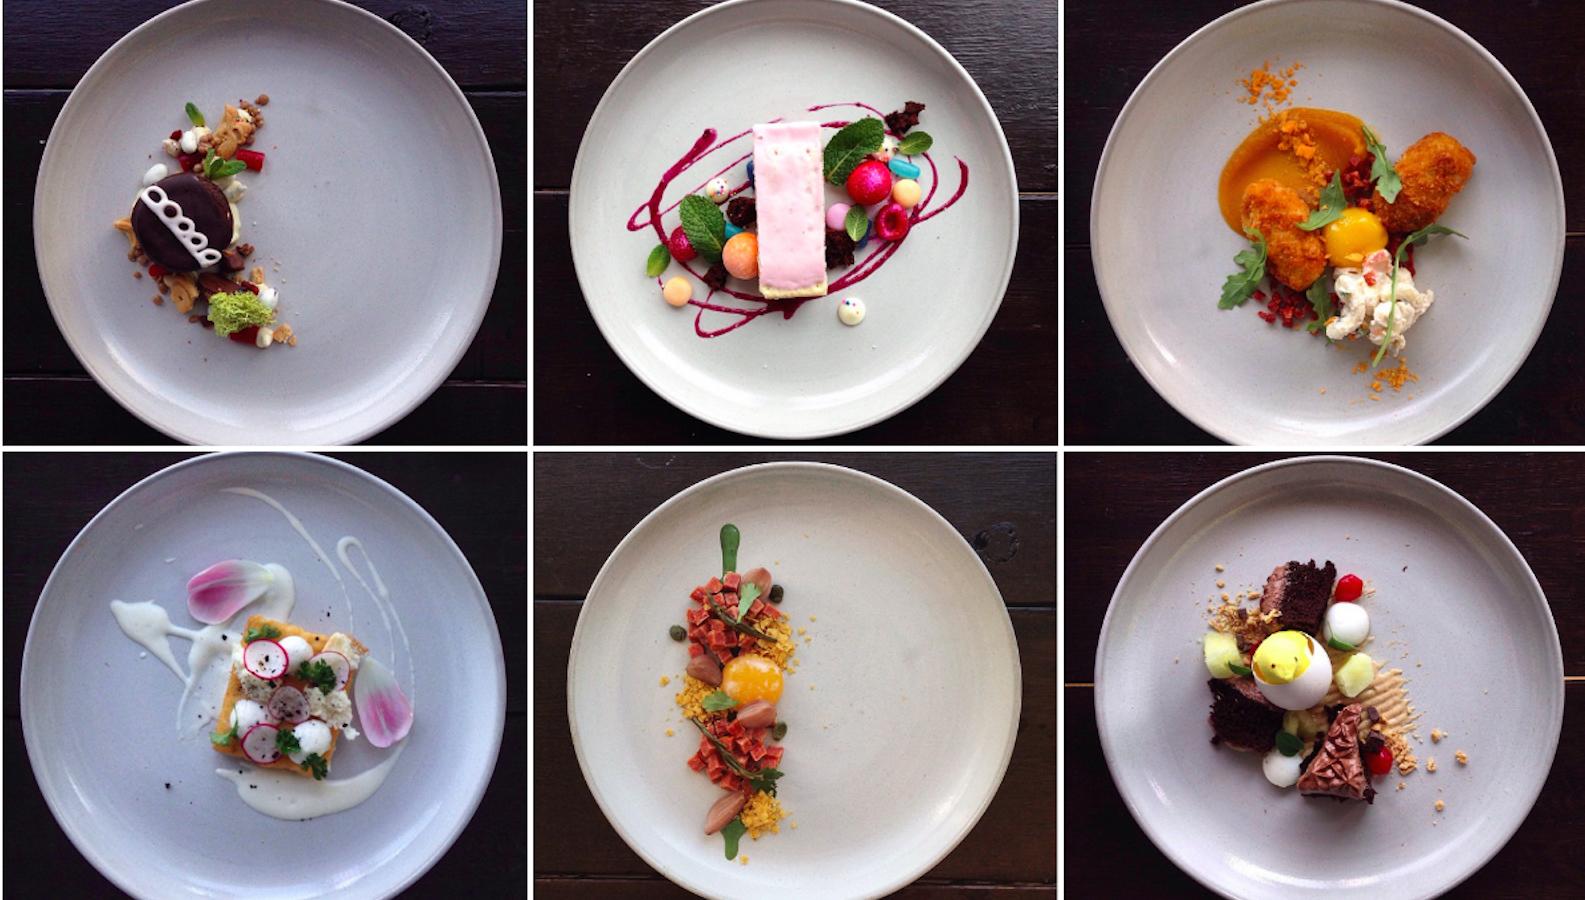 photos instagram chef parodies michelin style plating with junk food masterpieces quartz. Black Bedroom Furniture Sets. Home Design Ideas